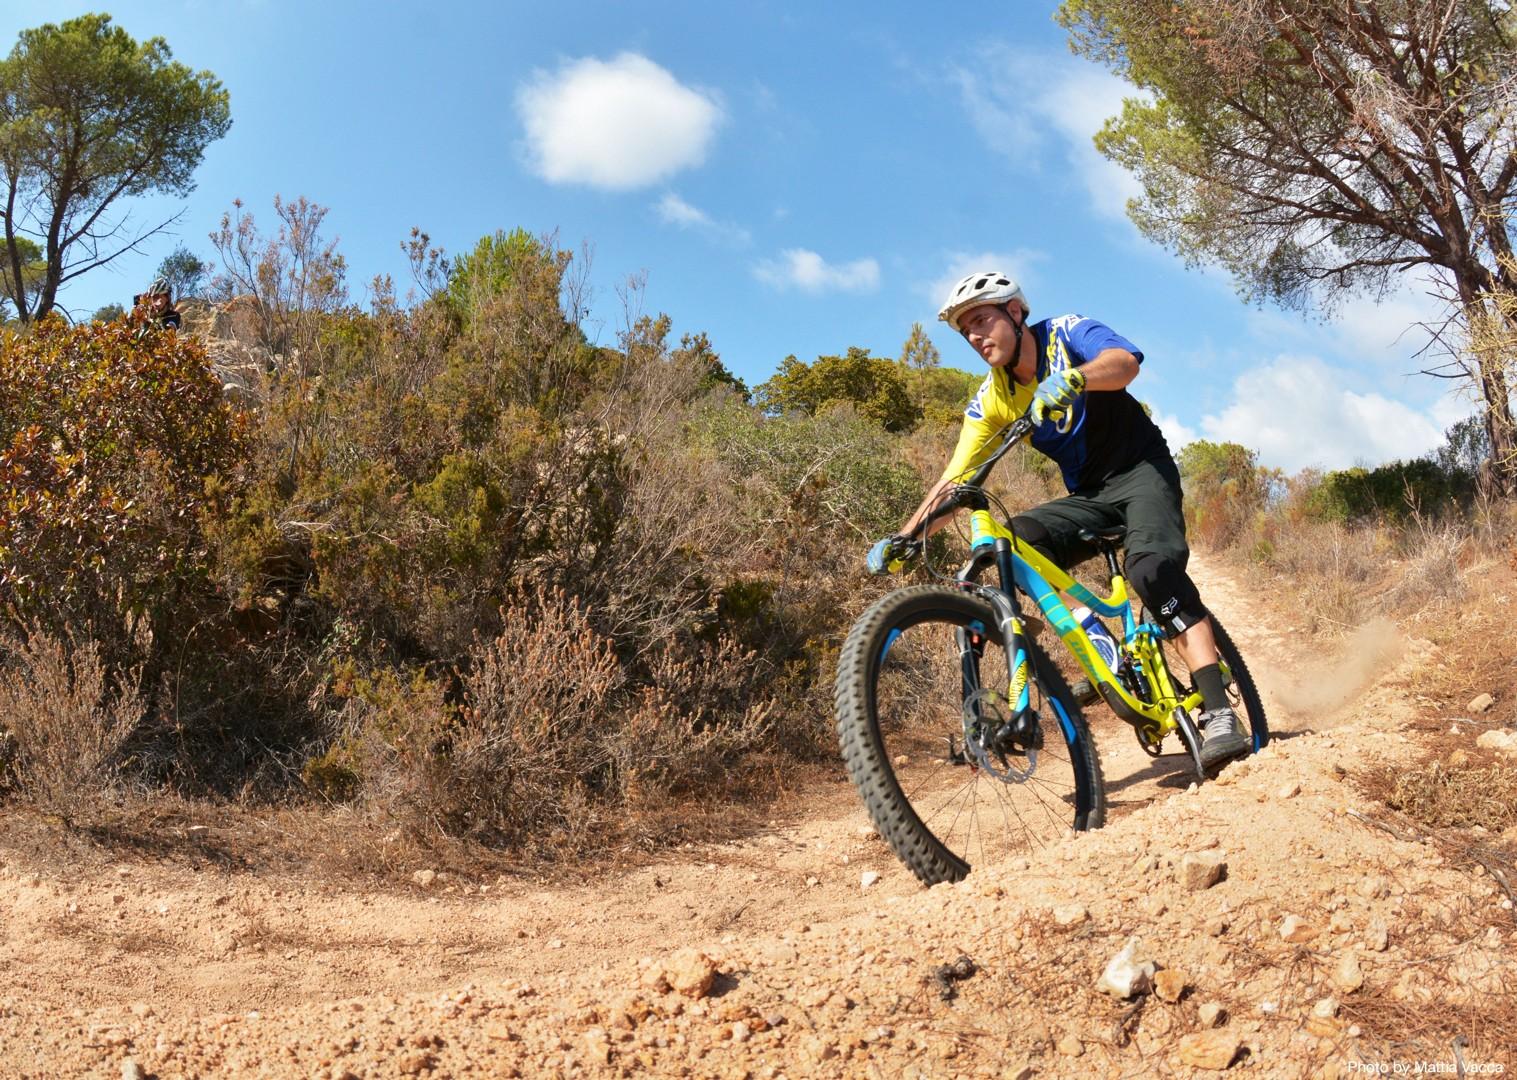 trails-sardinian-enduro-italy-guided-mountain-bike-holiday.jpg - Sardinia - Sardinian Enduro - Guided Mountain Bike Holiday - Italia Mountain Biking